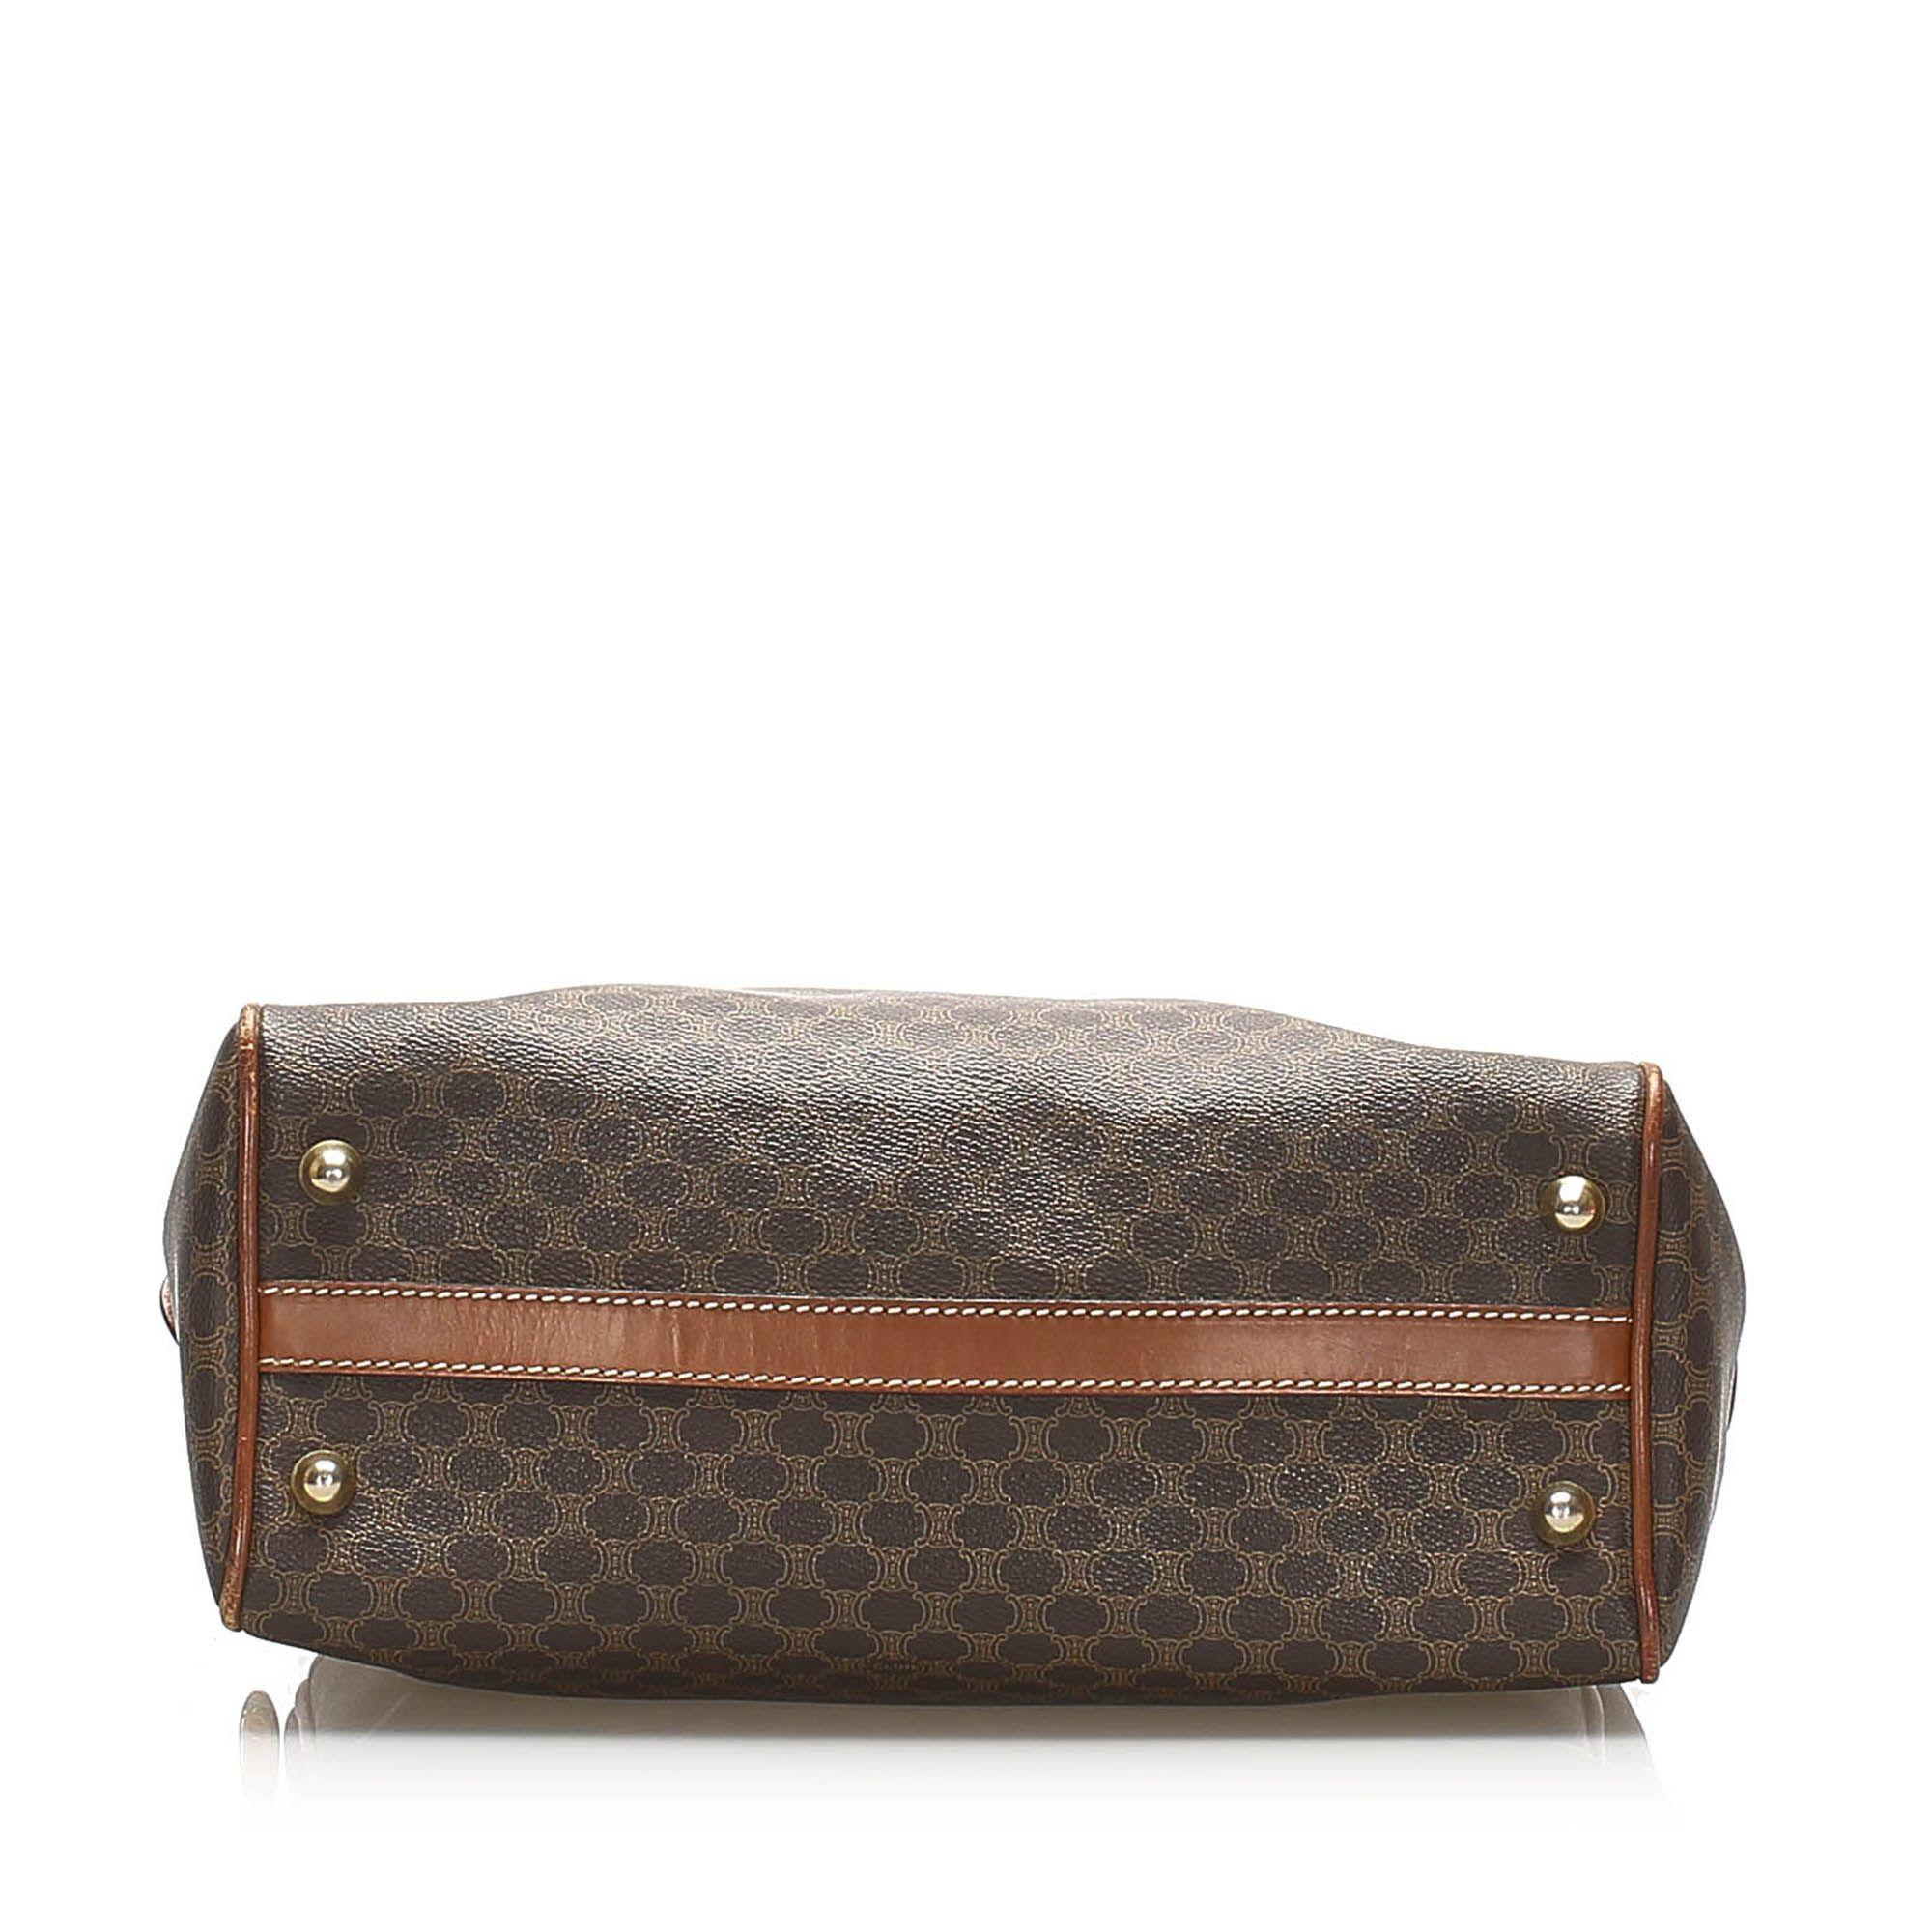 Vintage Celine Macadam Handbag Brown